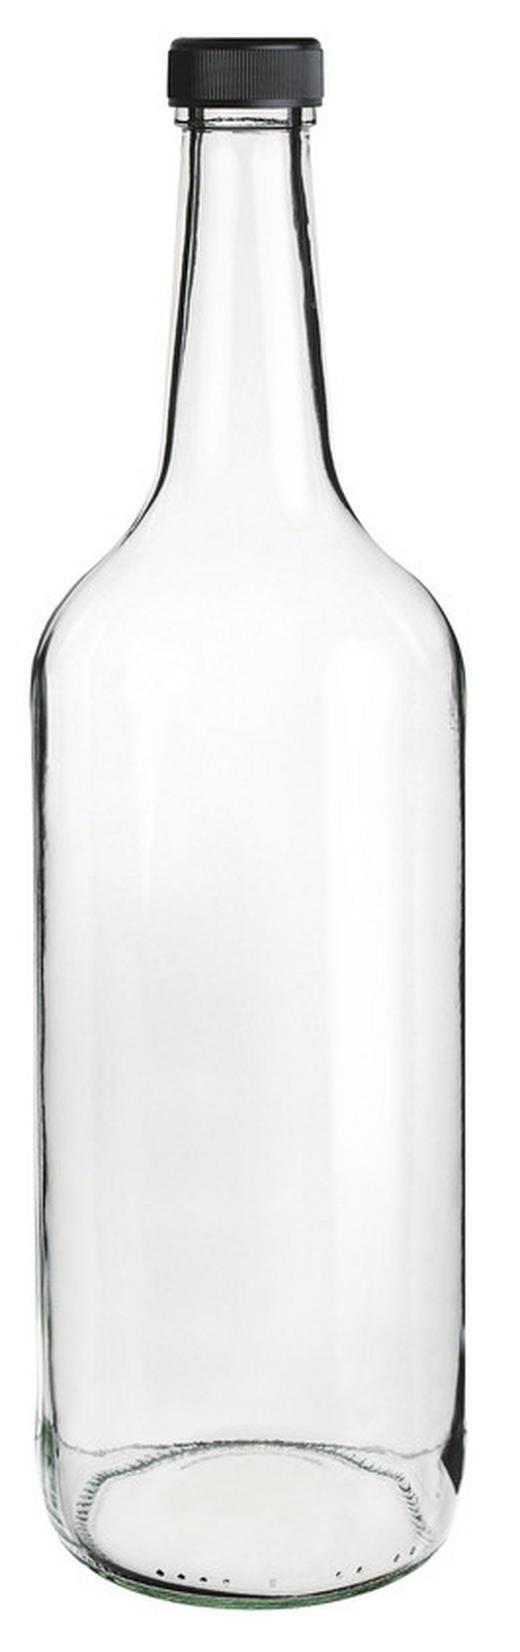 SAFTFLASCHE 1 l - Klar, Basics, Glas (1l) - Homeware